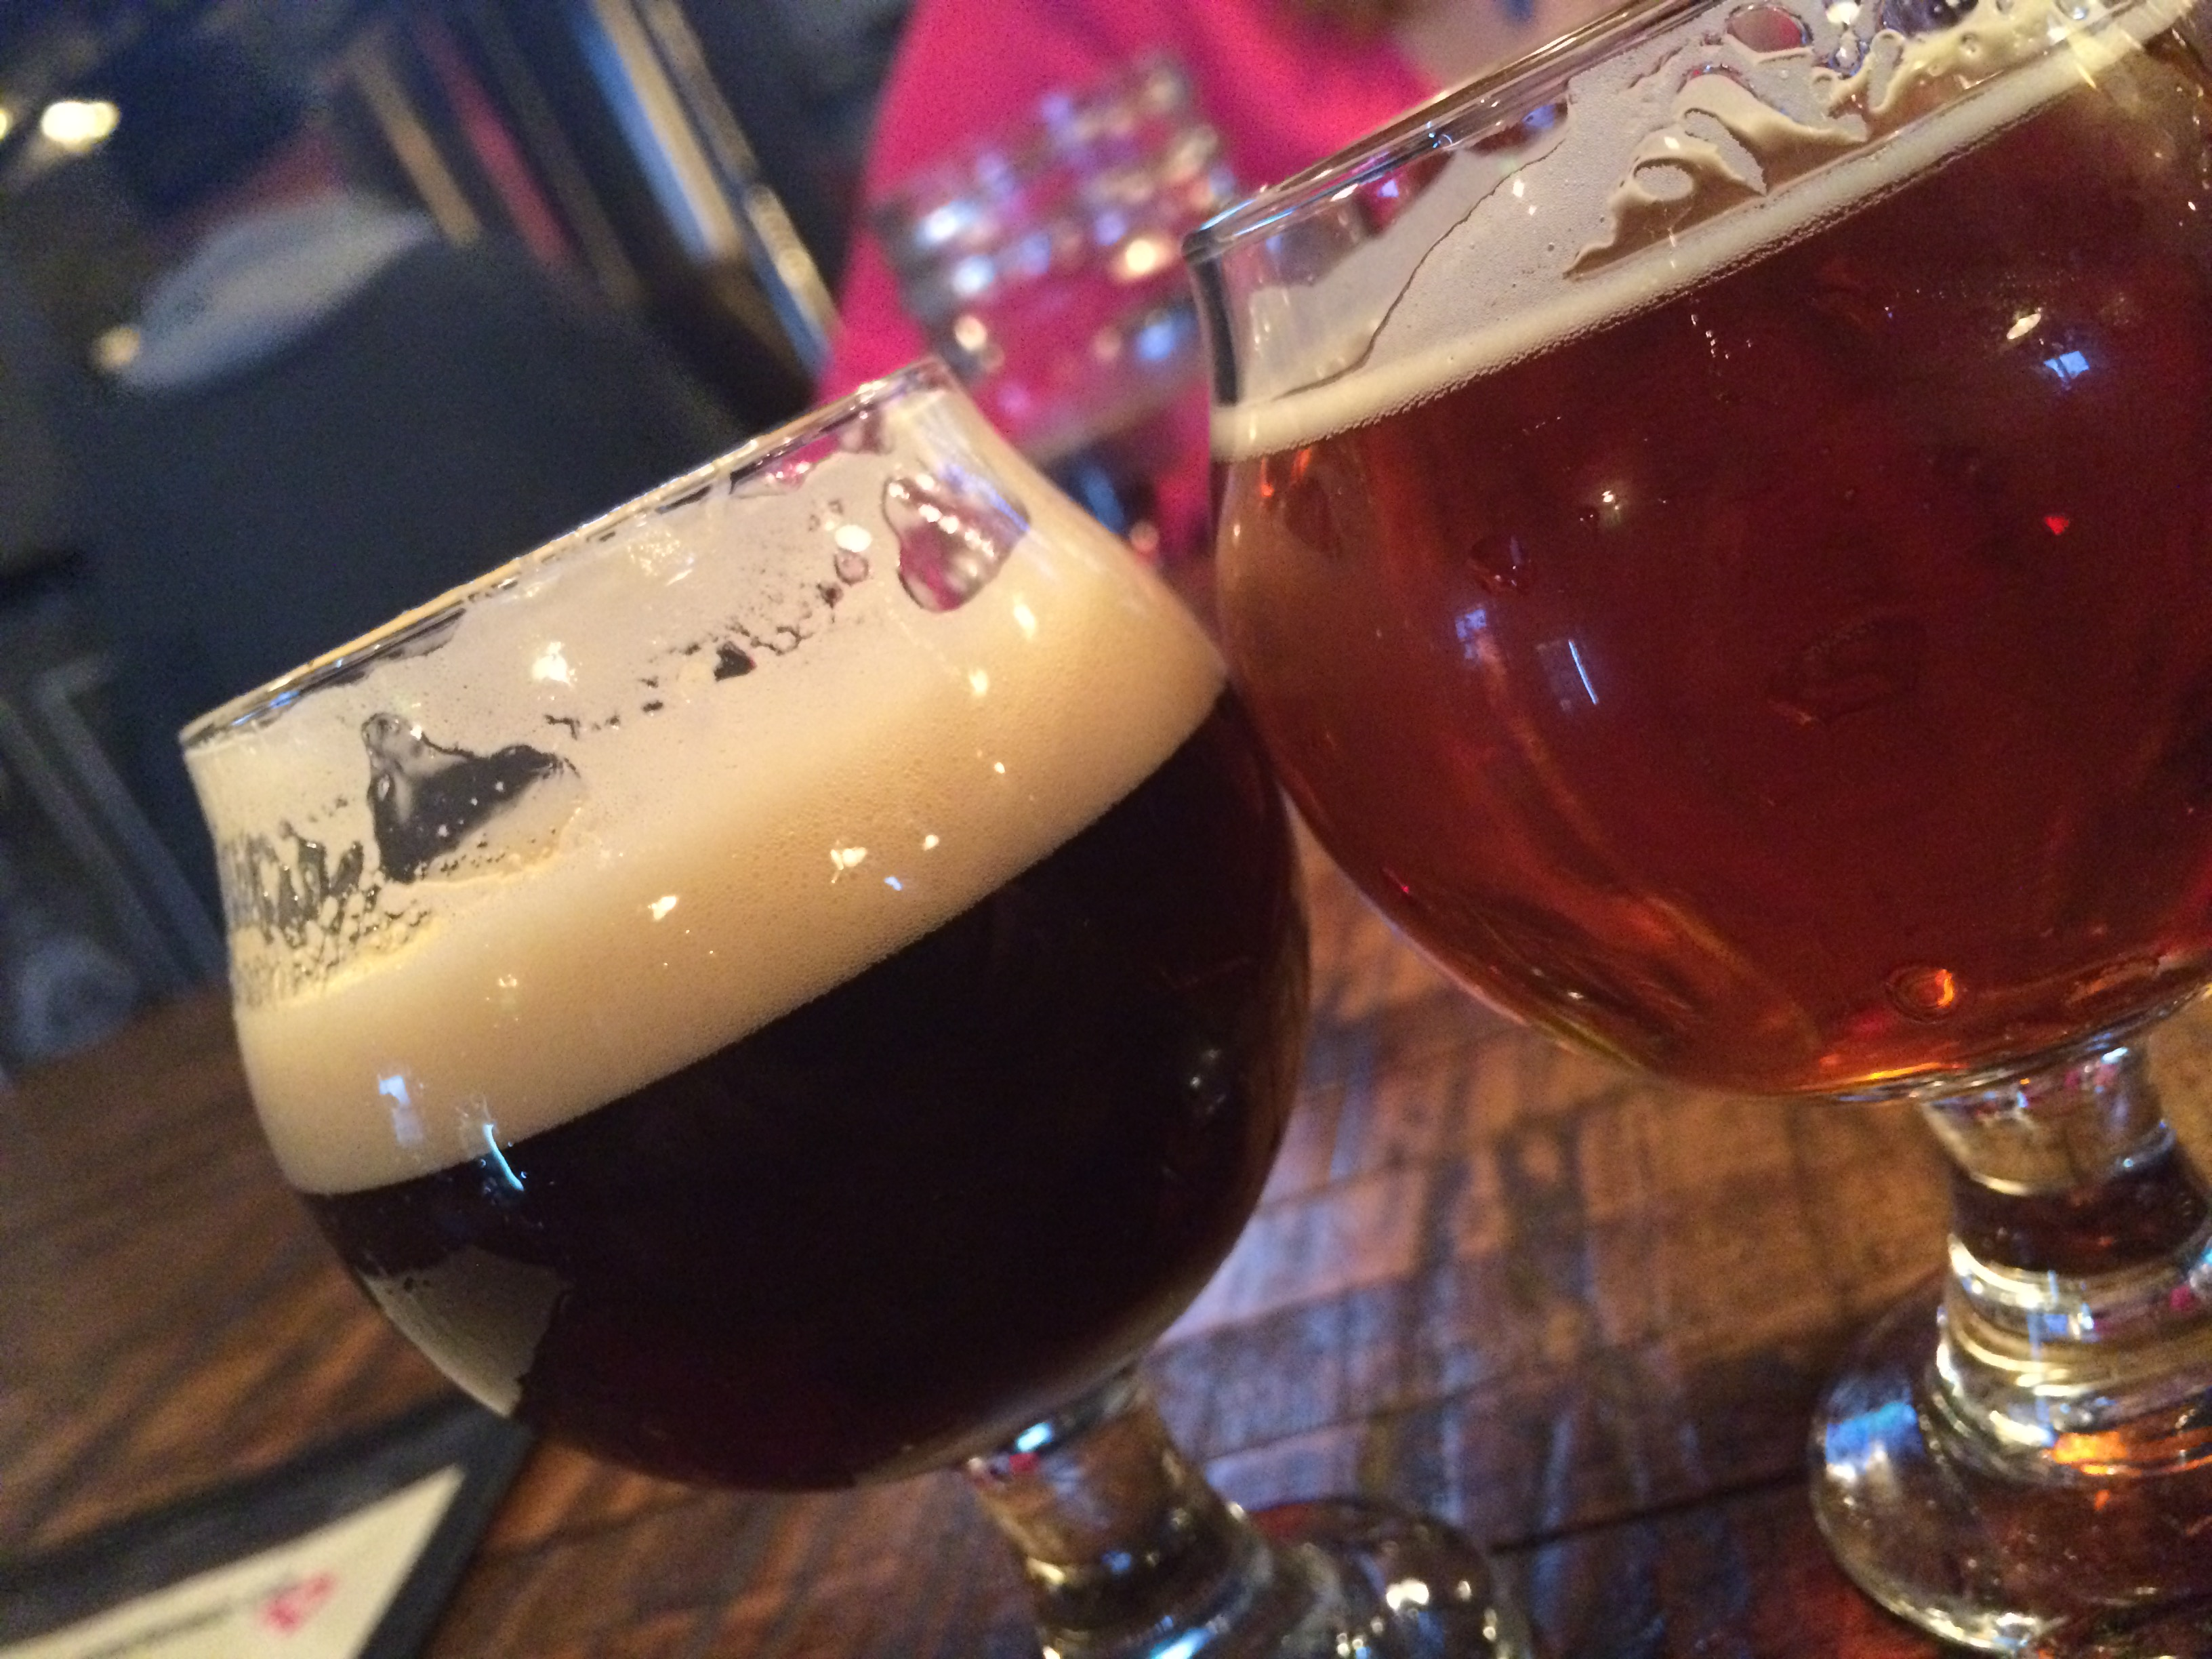 beer-black_shirt_brewery-denver_co-bar-microbrewery-tf_2016__15_